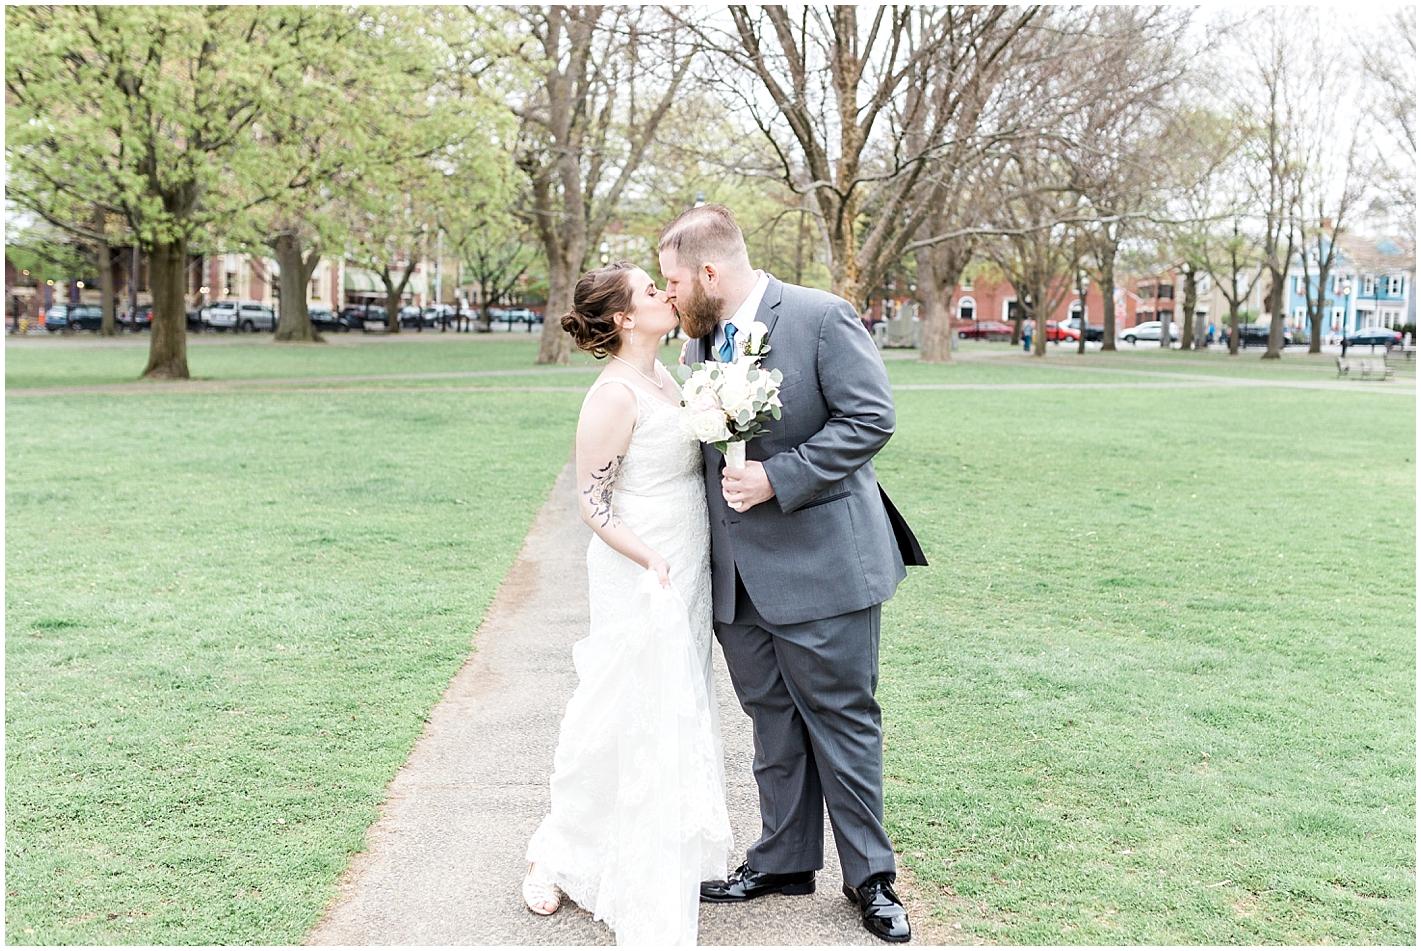 Downtown Salem Massachusetts Wedding Photos By Alyssa Parker Photography